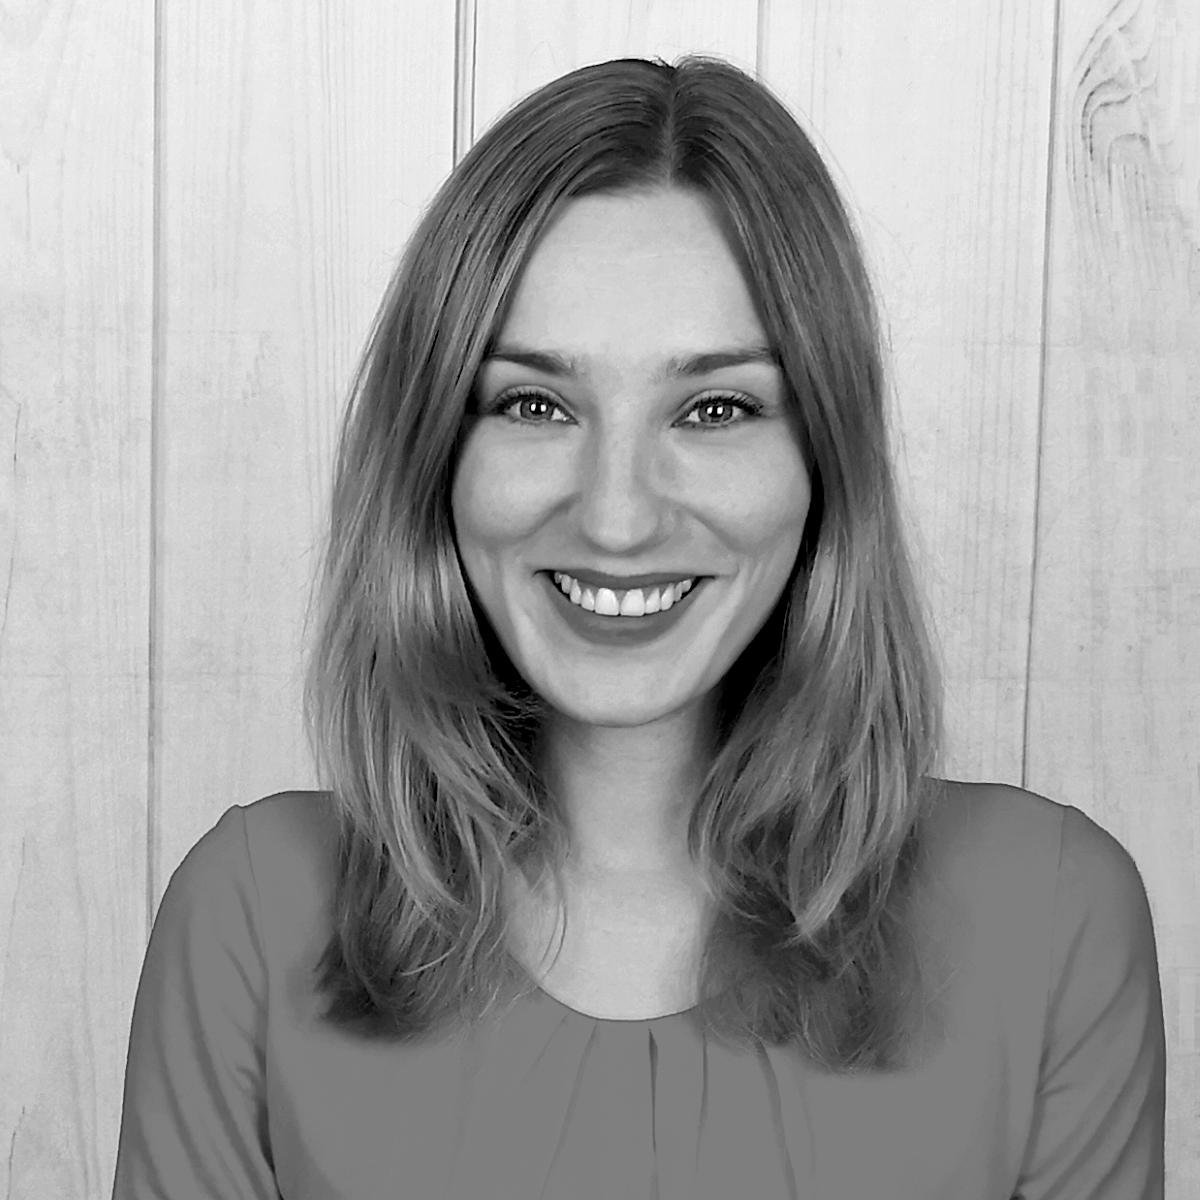 Michaela Fröhlich